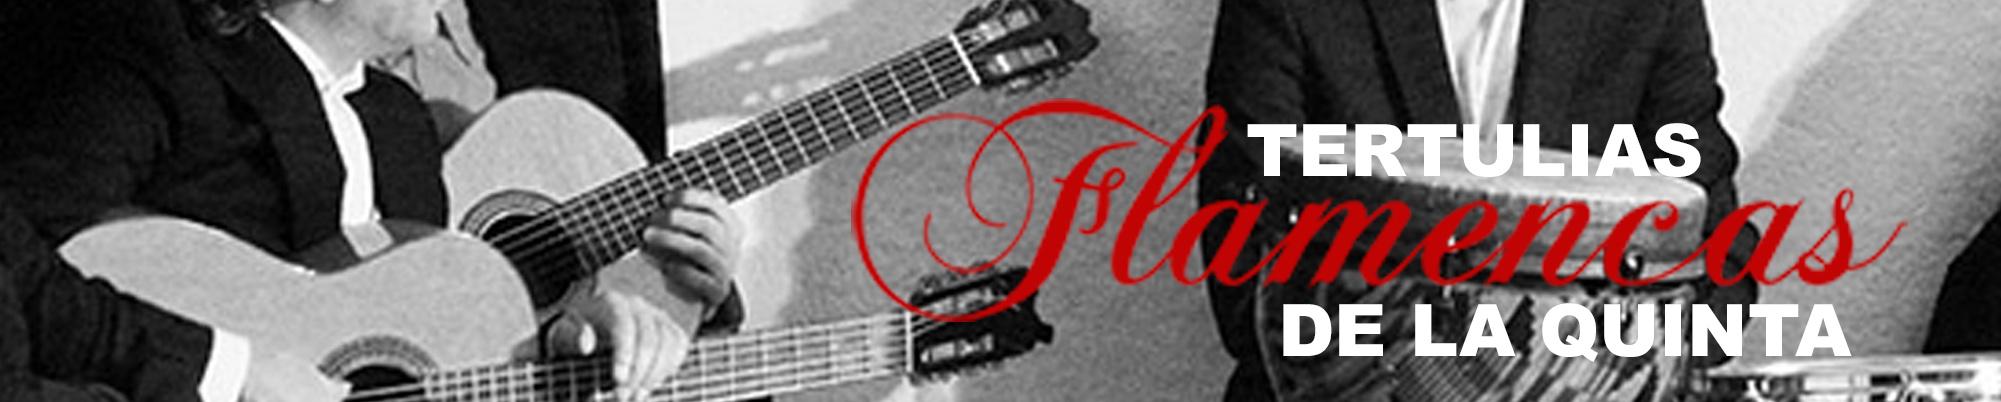 Flamenco_Quinta_Del_Sordo_Tertulias_2